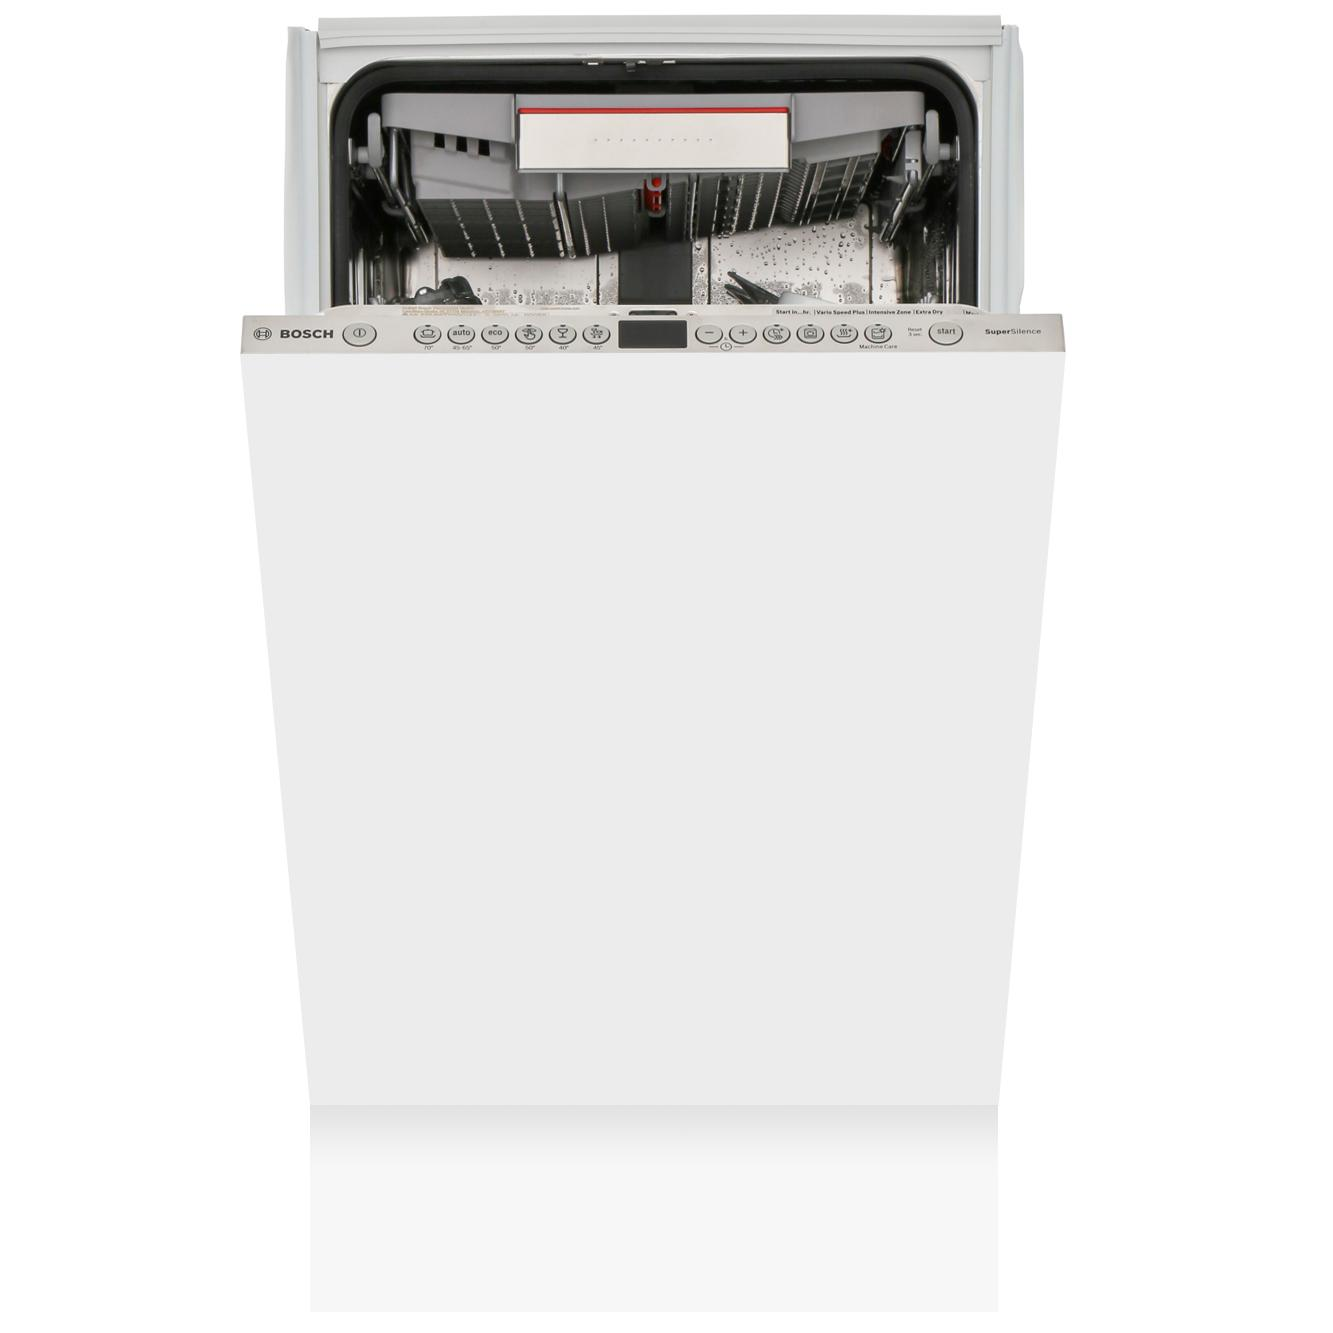 Bosch Serie 6 SPV66TX00G Built In Fully Int. Slimline Dishwasher